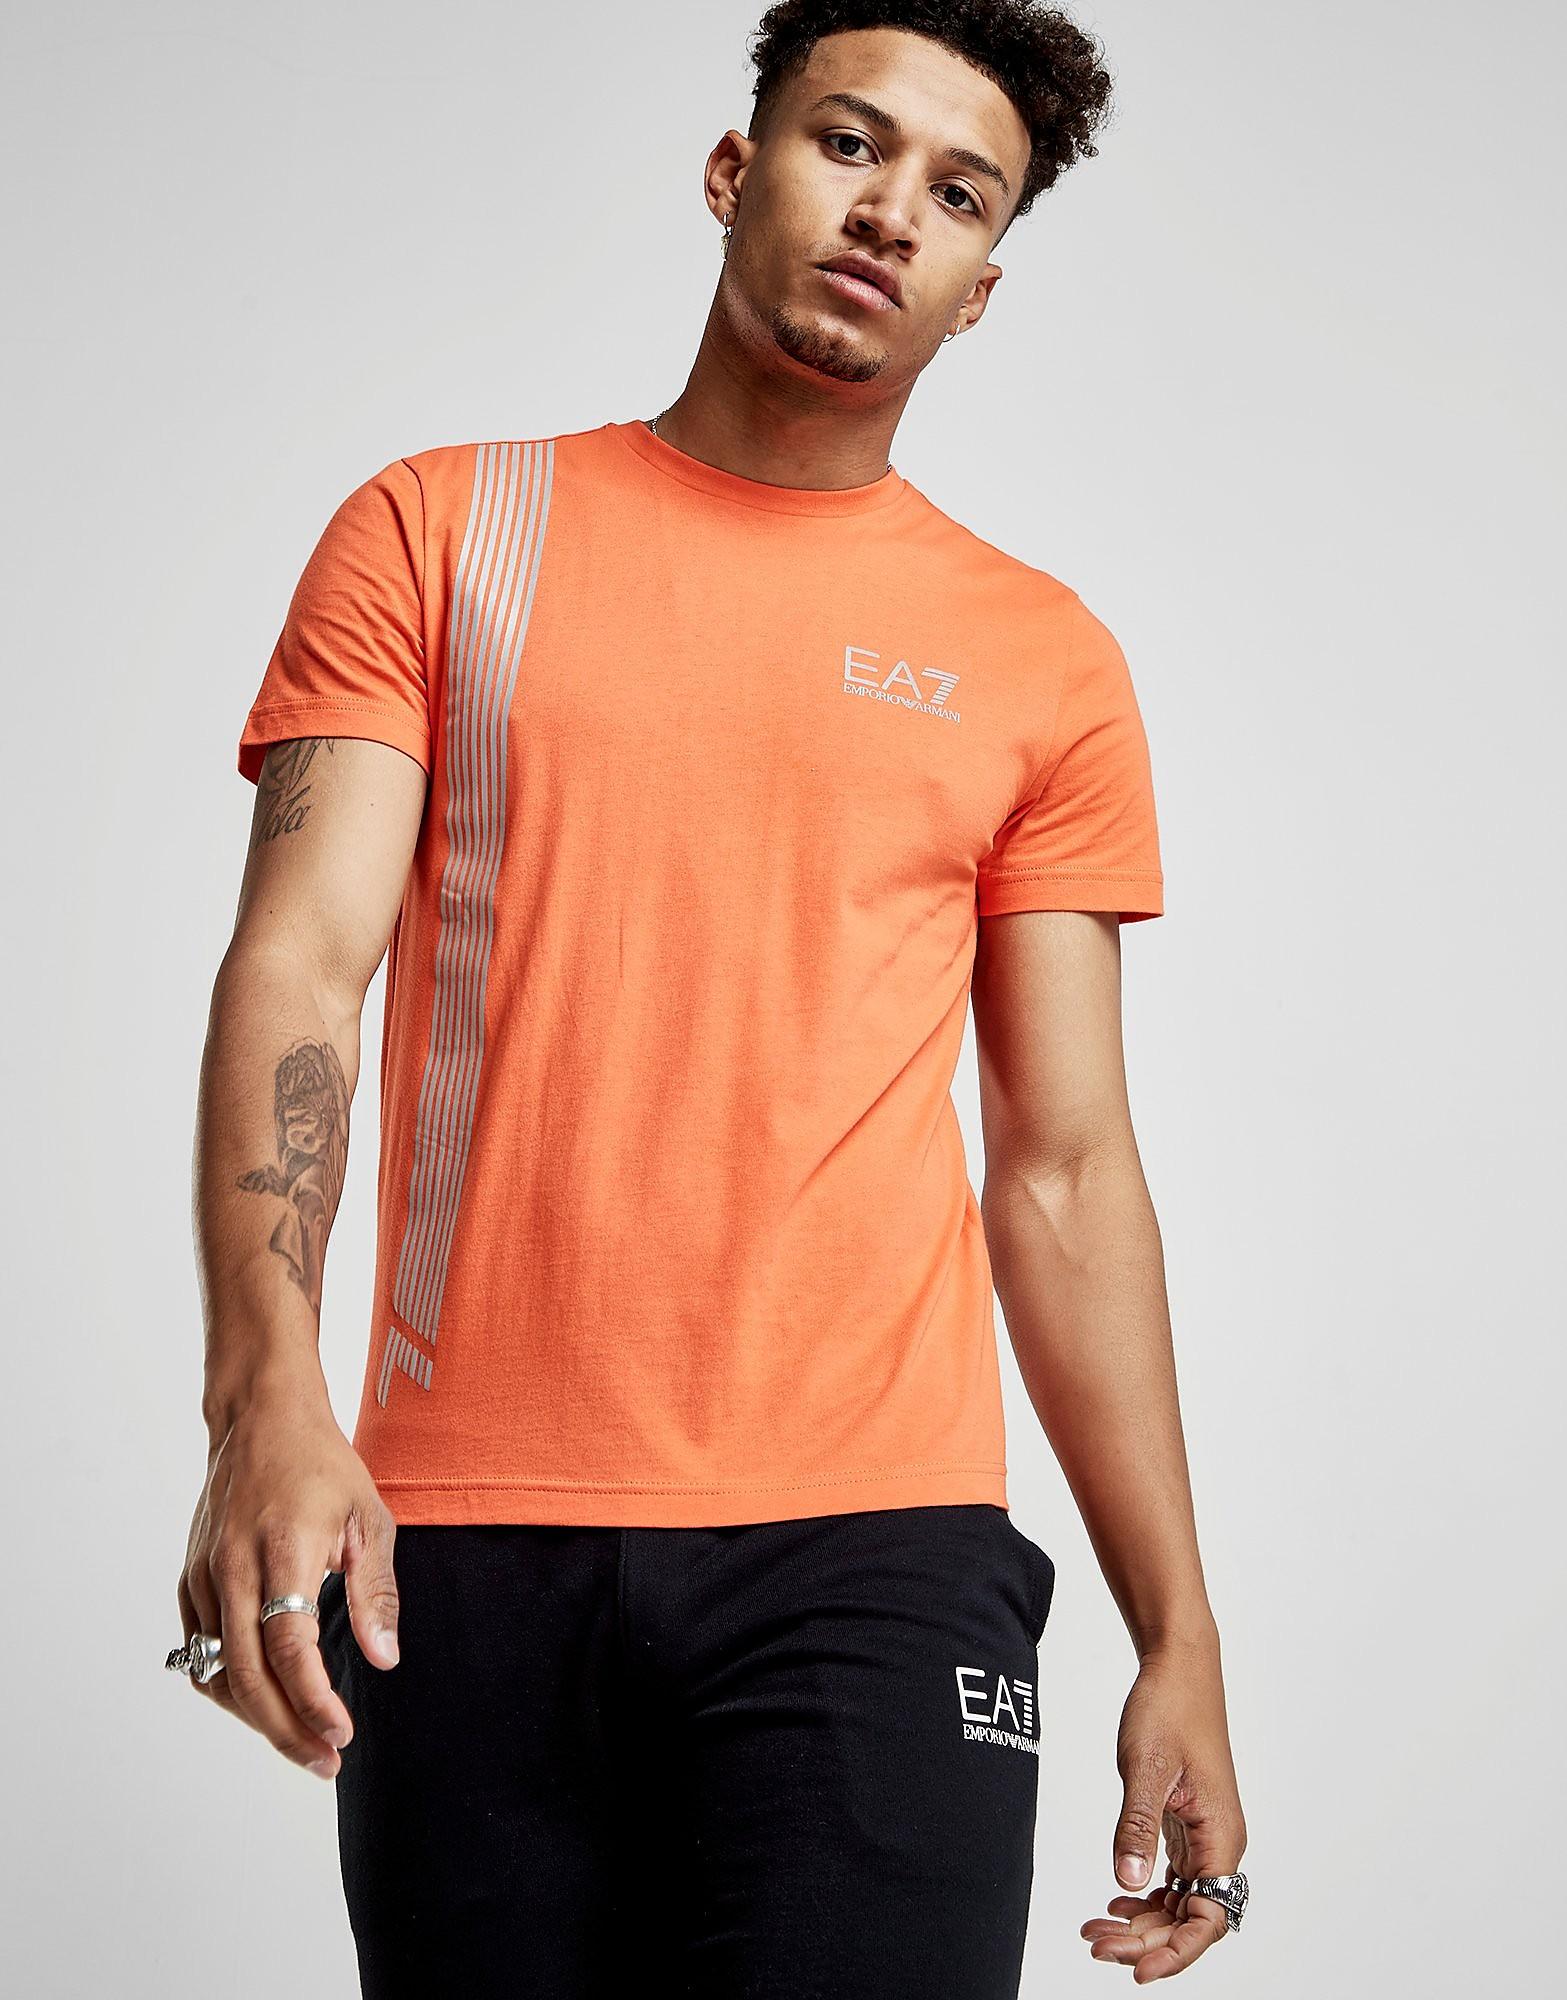 Emporio Armani EA7 T-shirt Homme